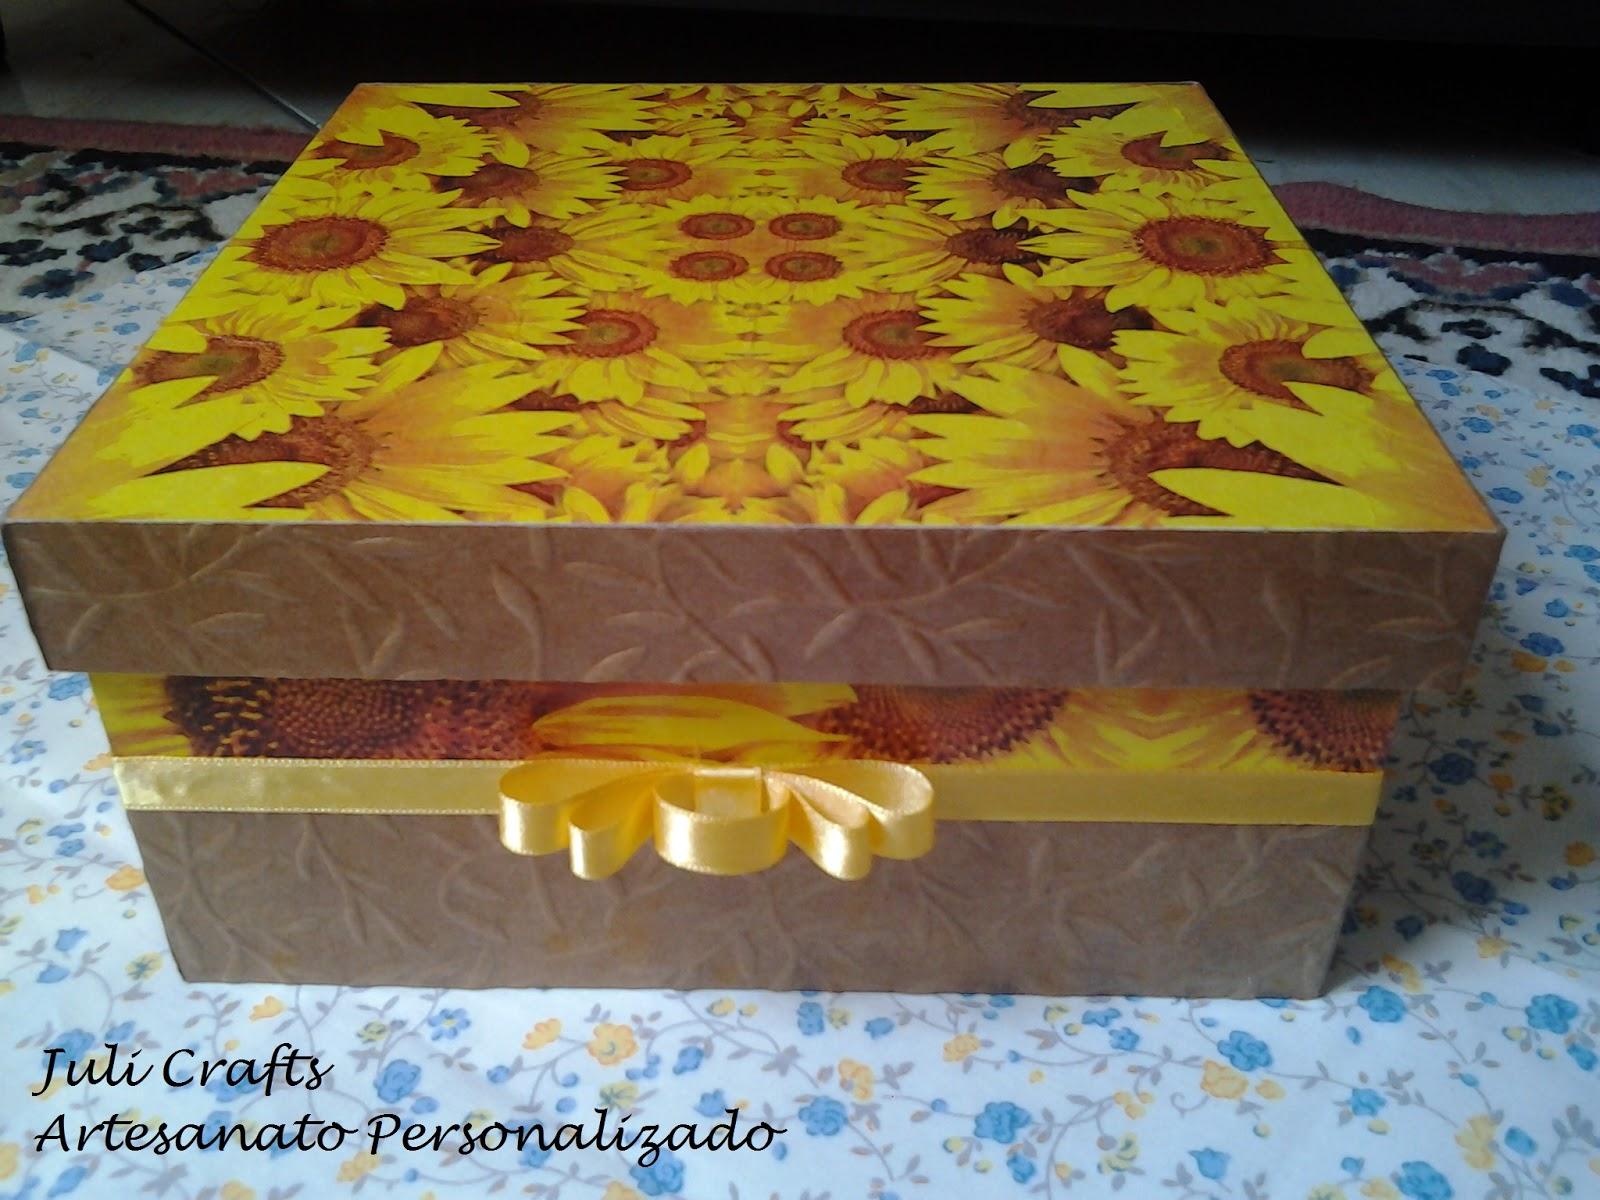 Artesanato Goiania Go ~ Juli Crafts Artesanato Personalizado Caixa MDF Girassol